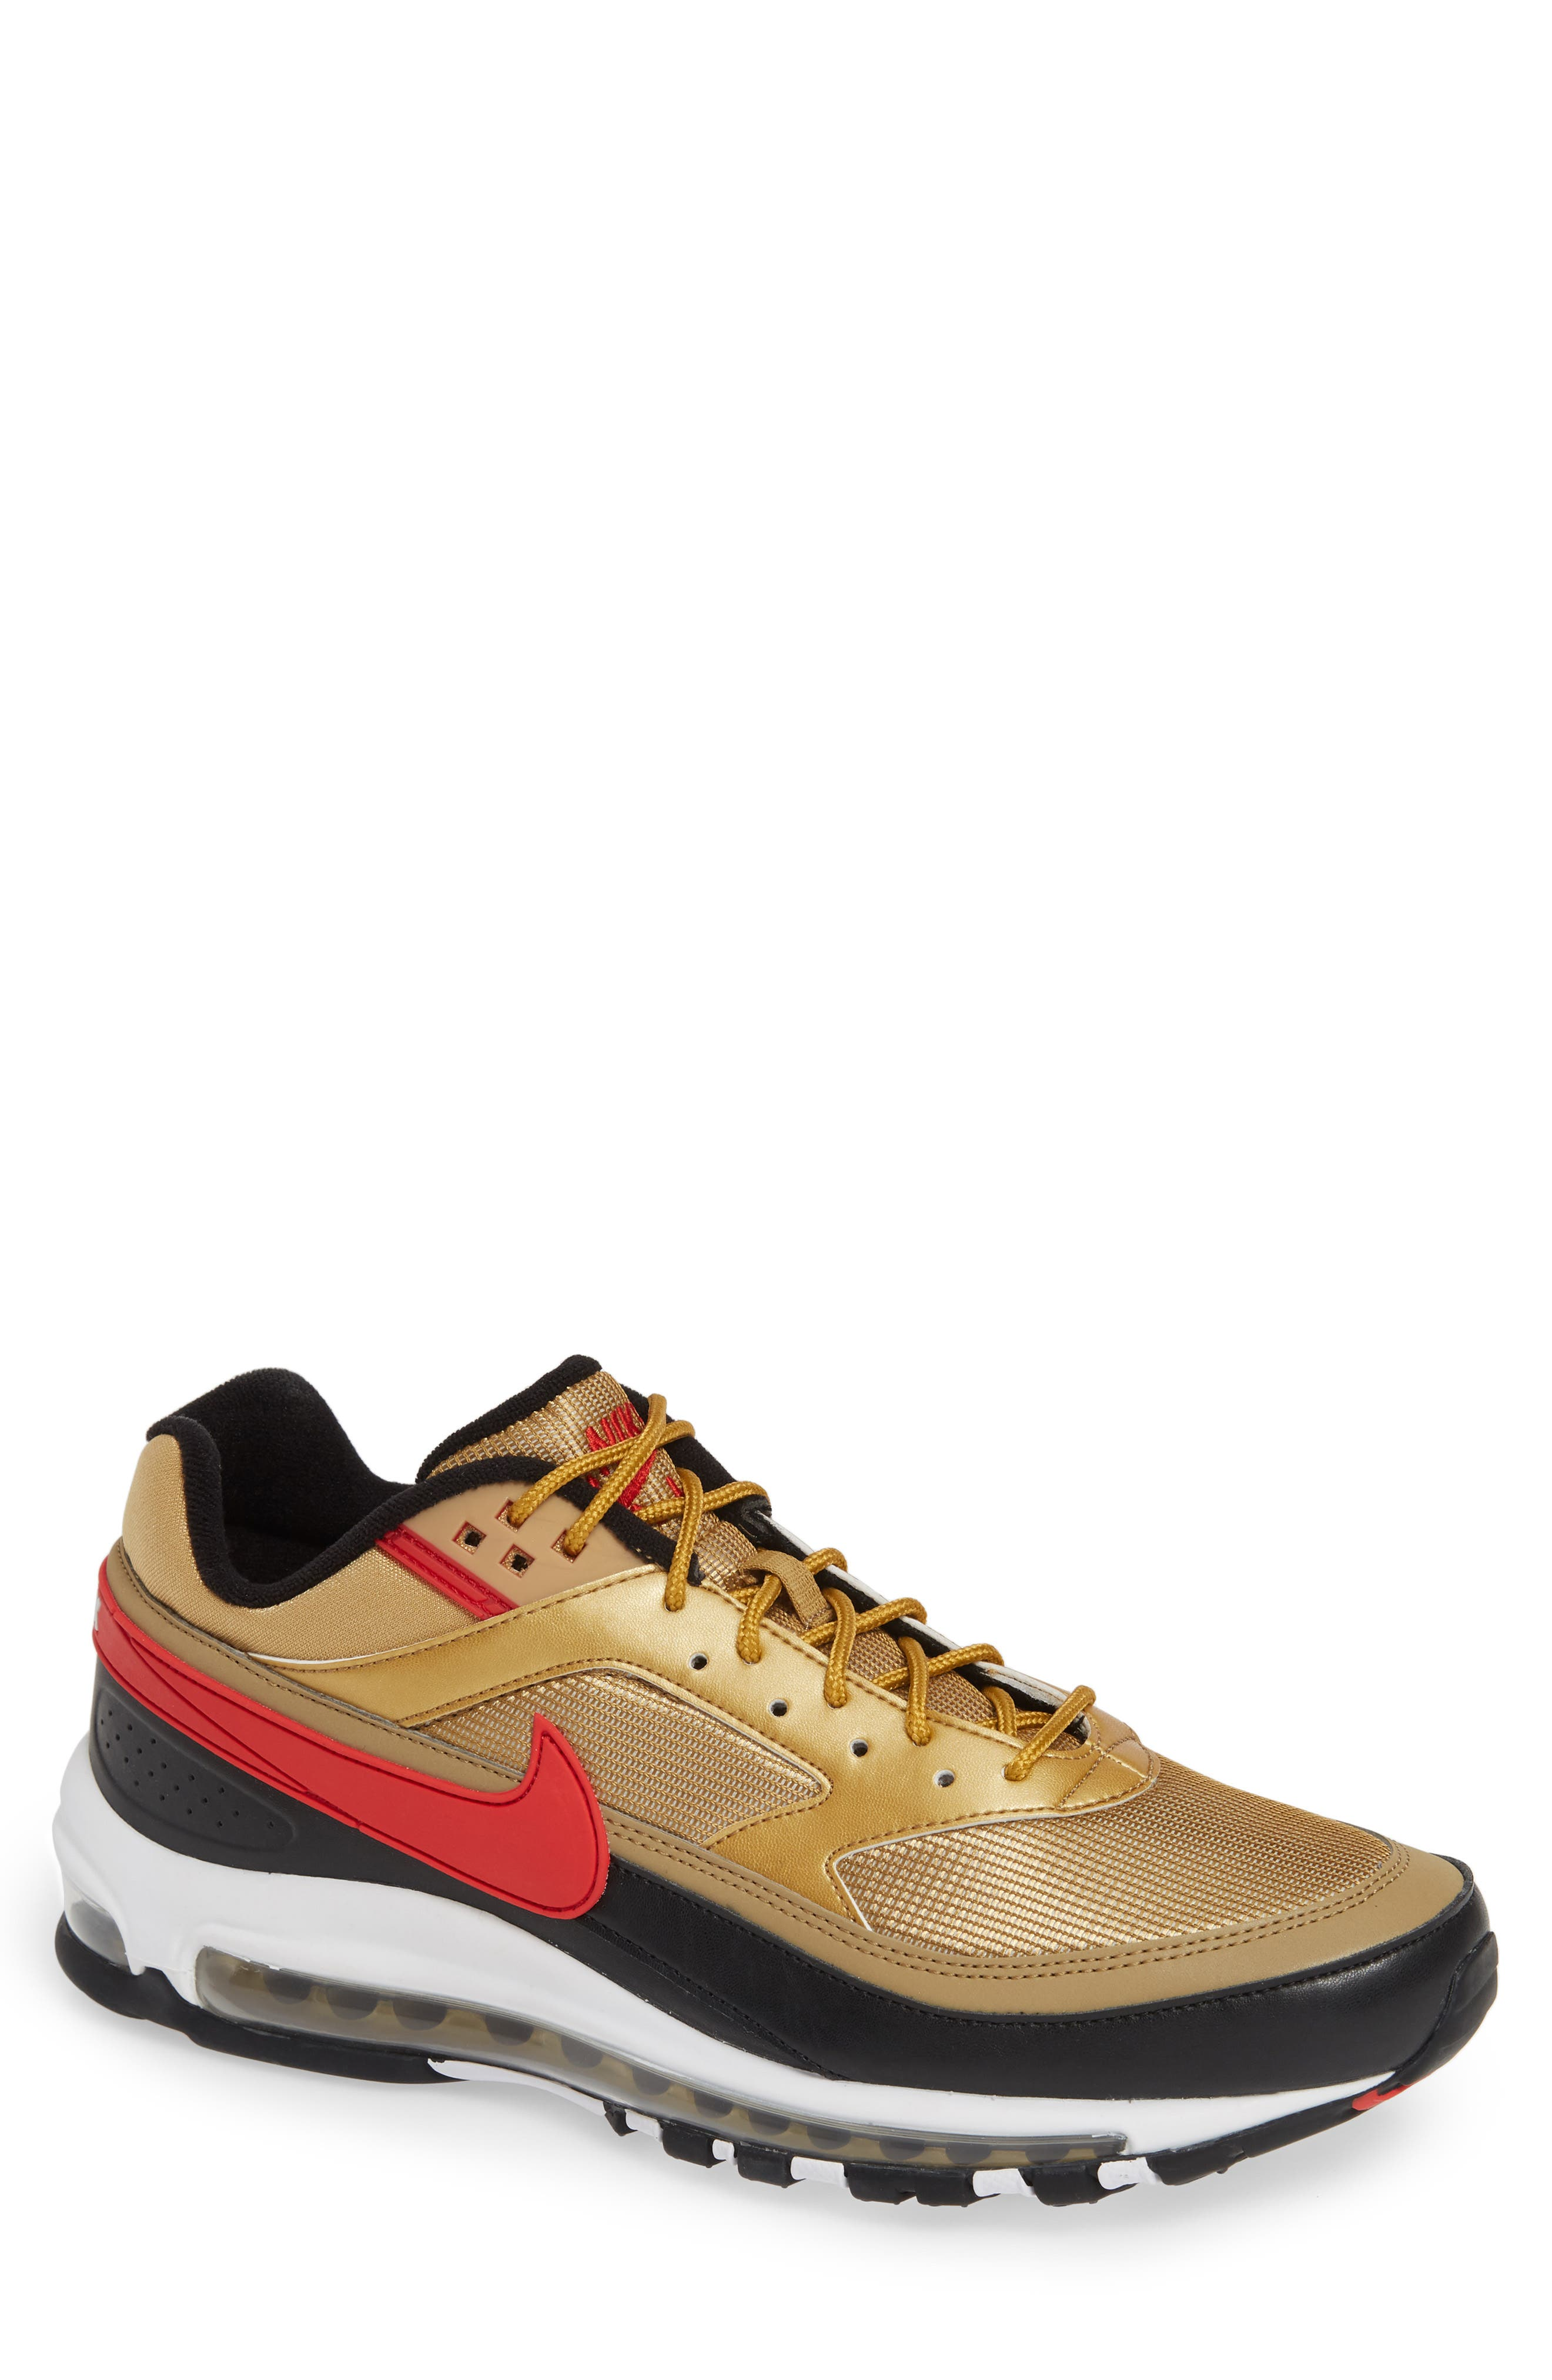 NIKE, Air Max 97 BW Sneaker, Main thumbnail 1, color, 040